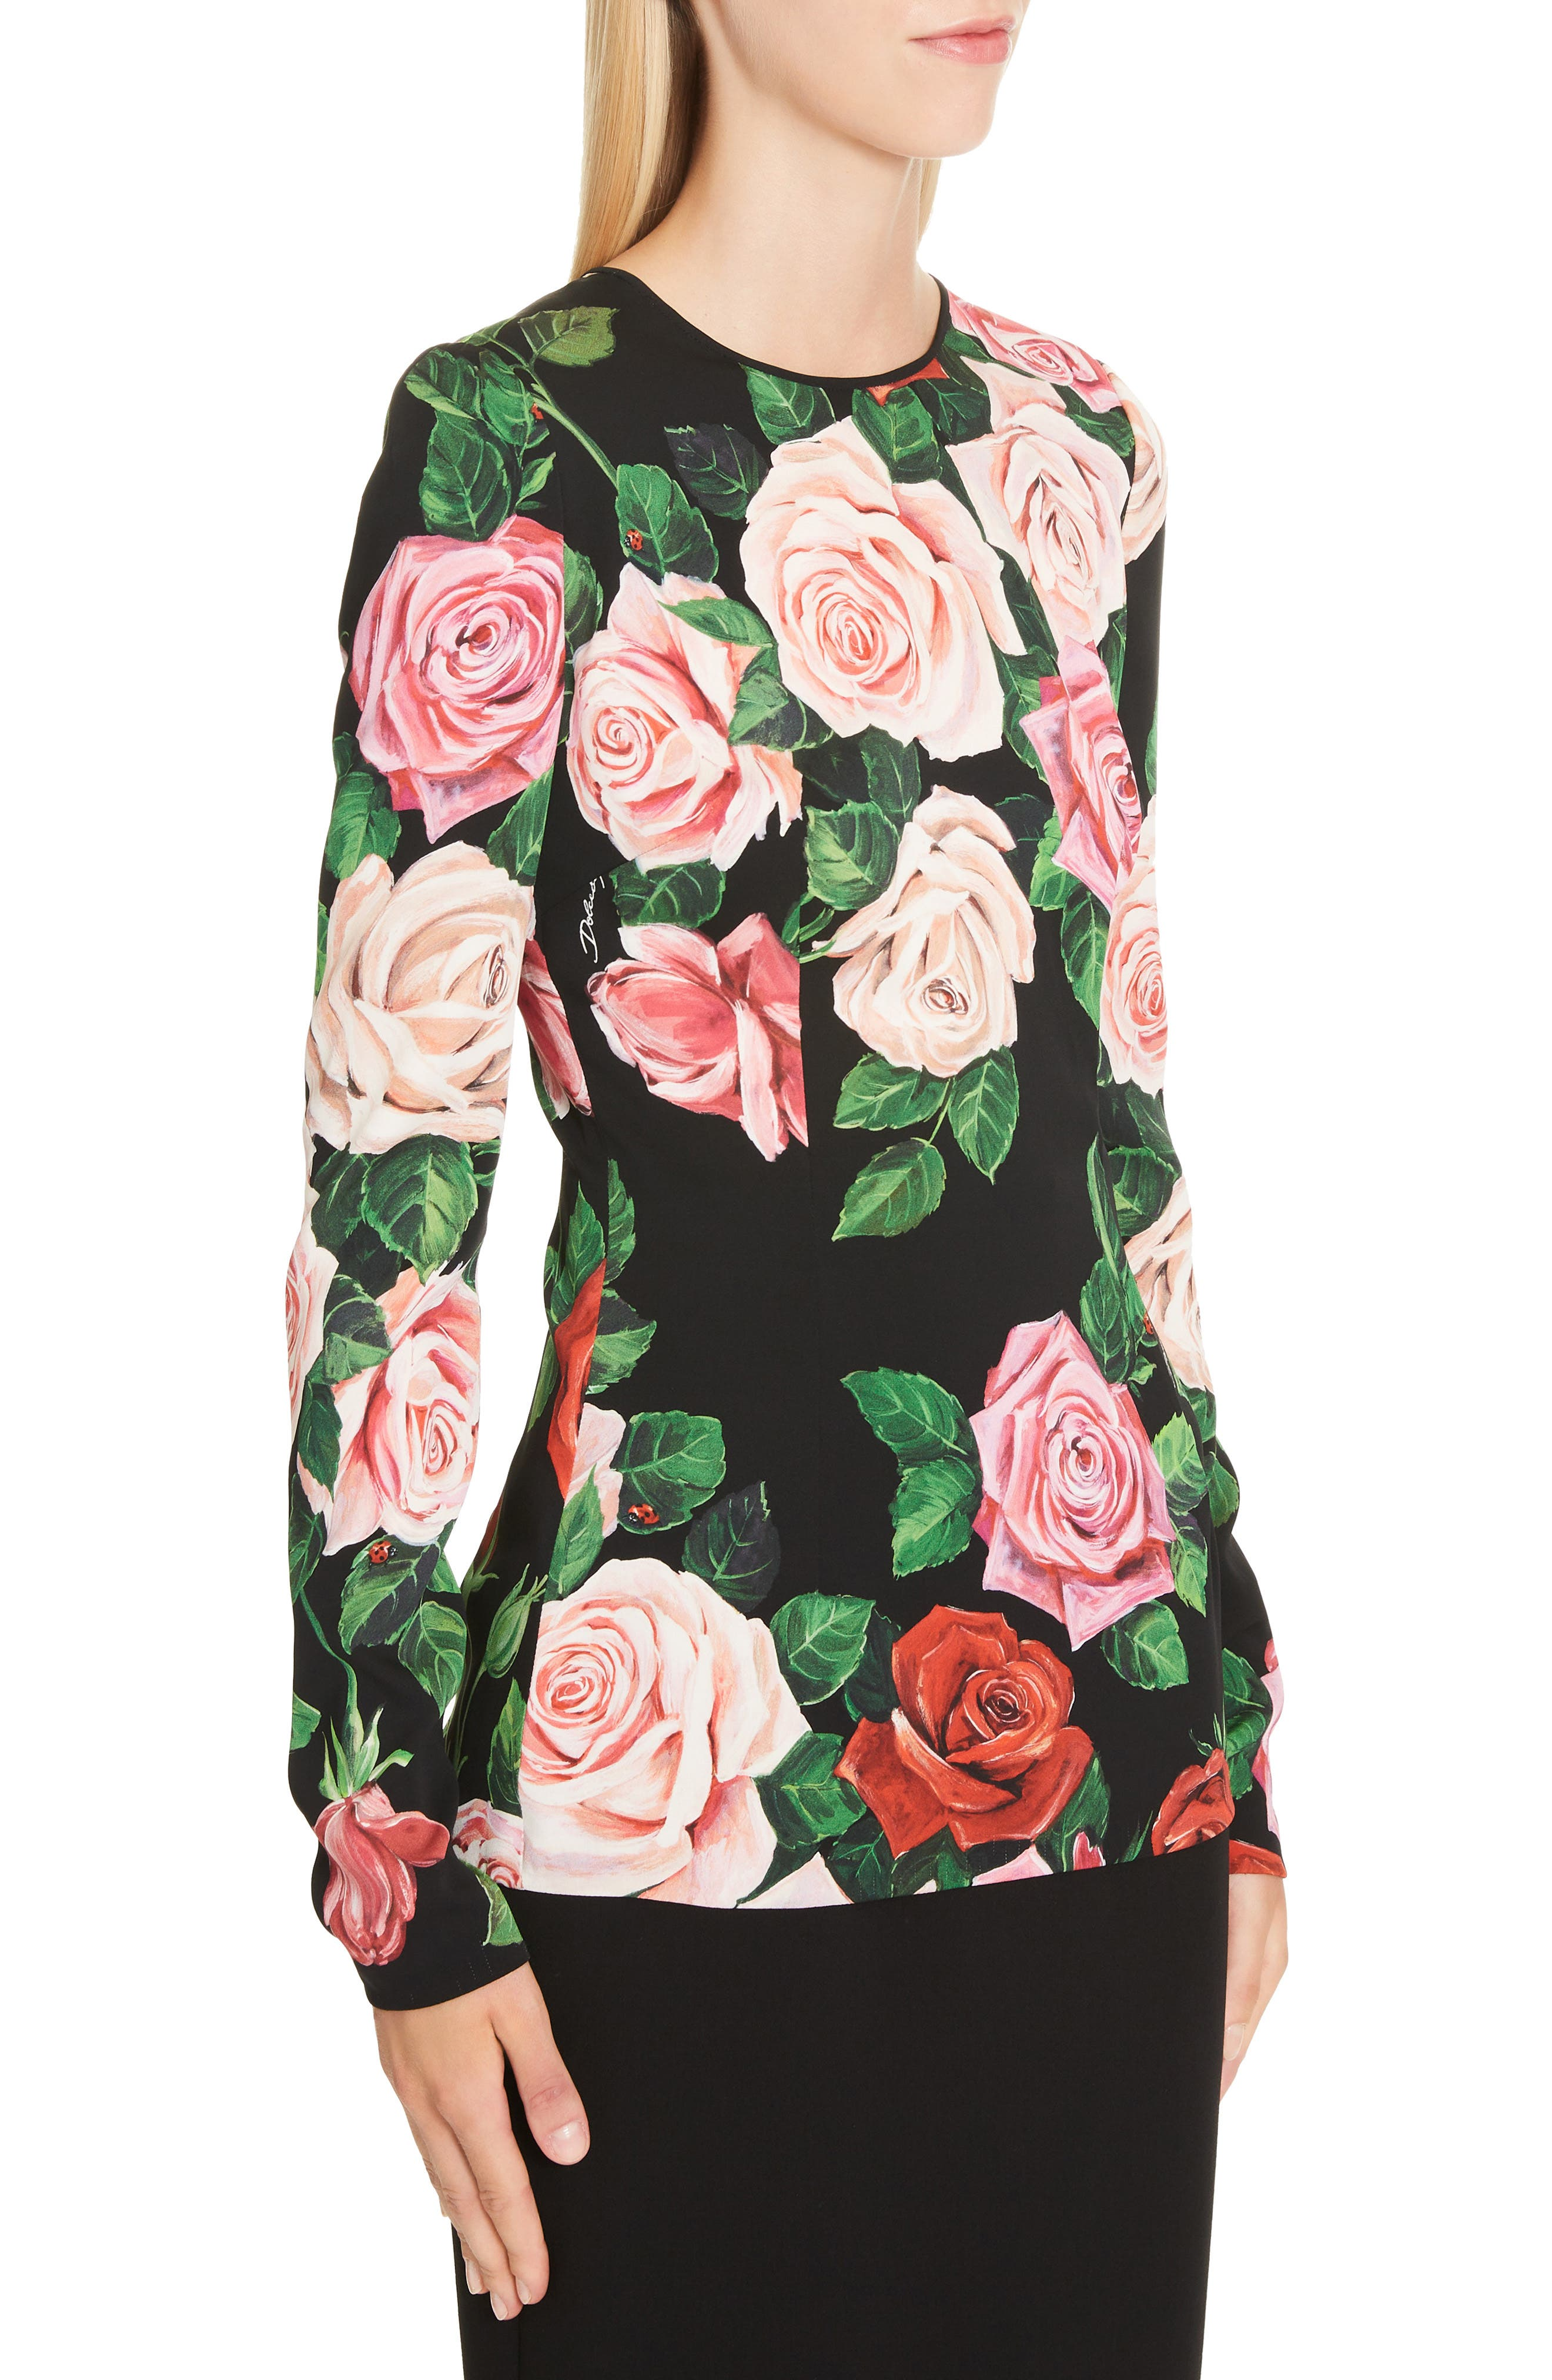 DOLCE&GABBANA, Rose Print Stretch Silk Top, Alternate thumbnail 4, color, BLACK ROSE